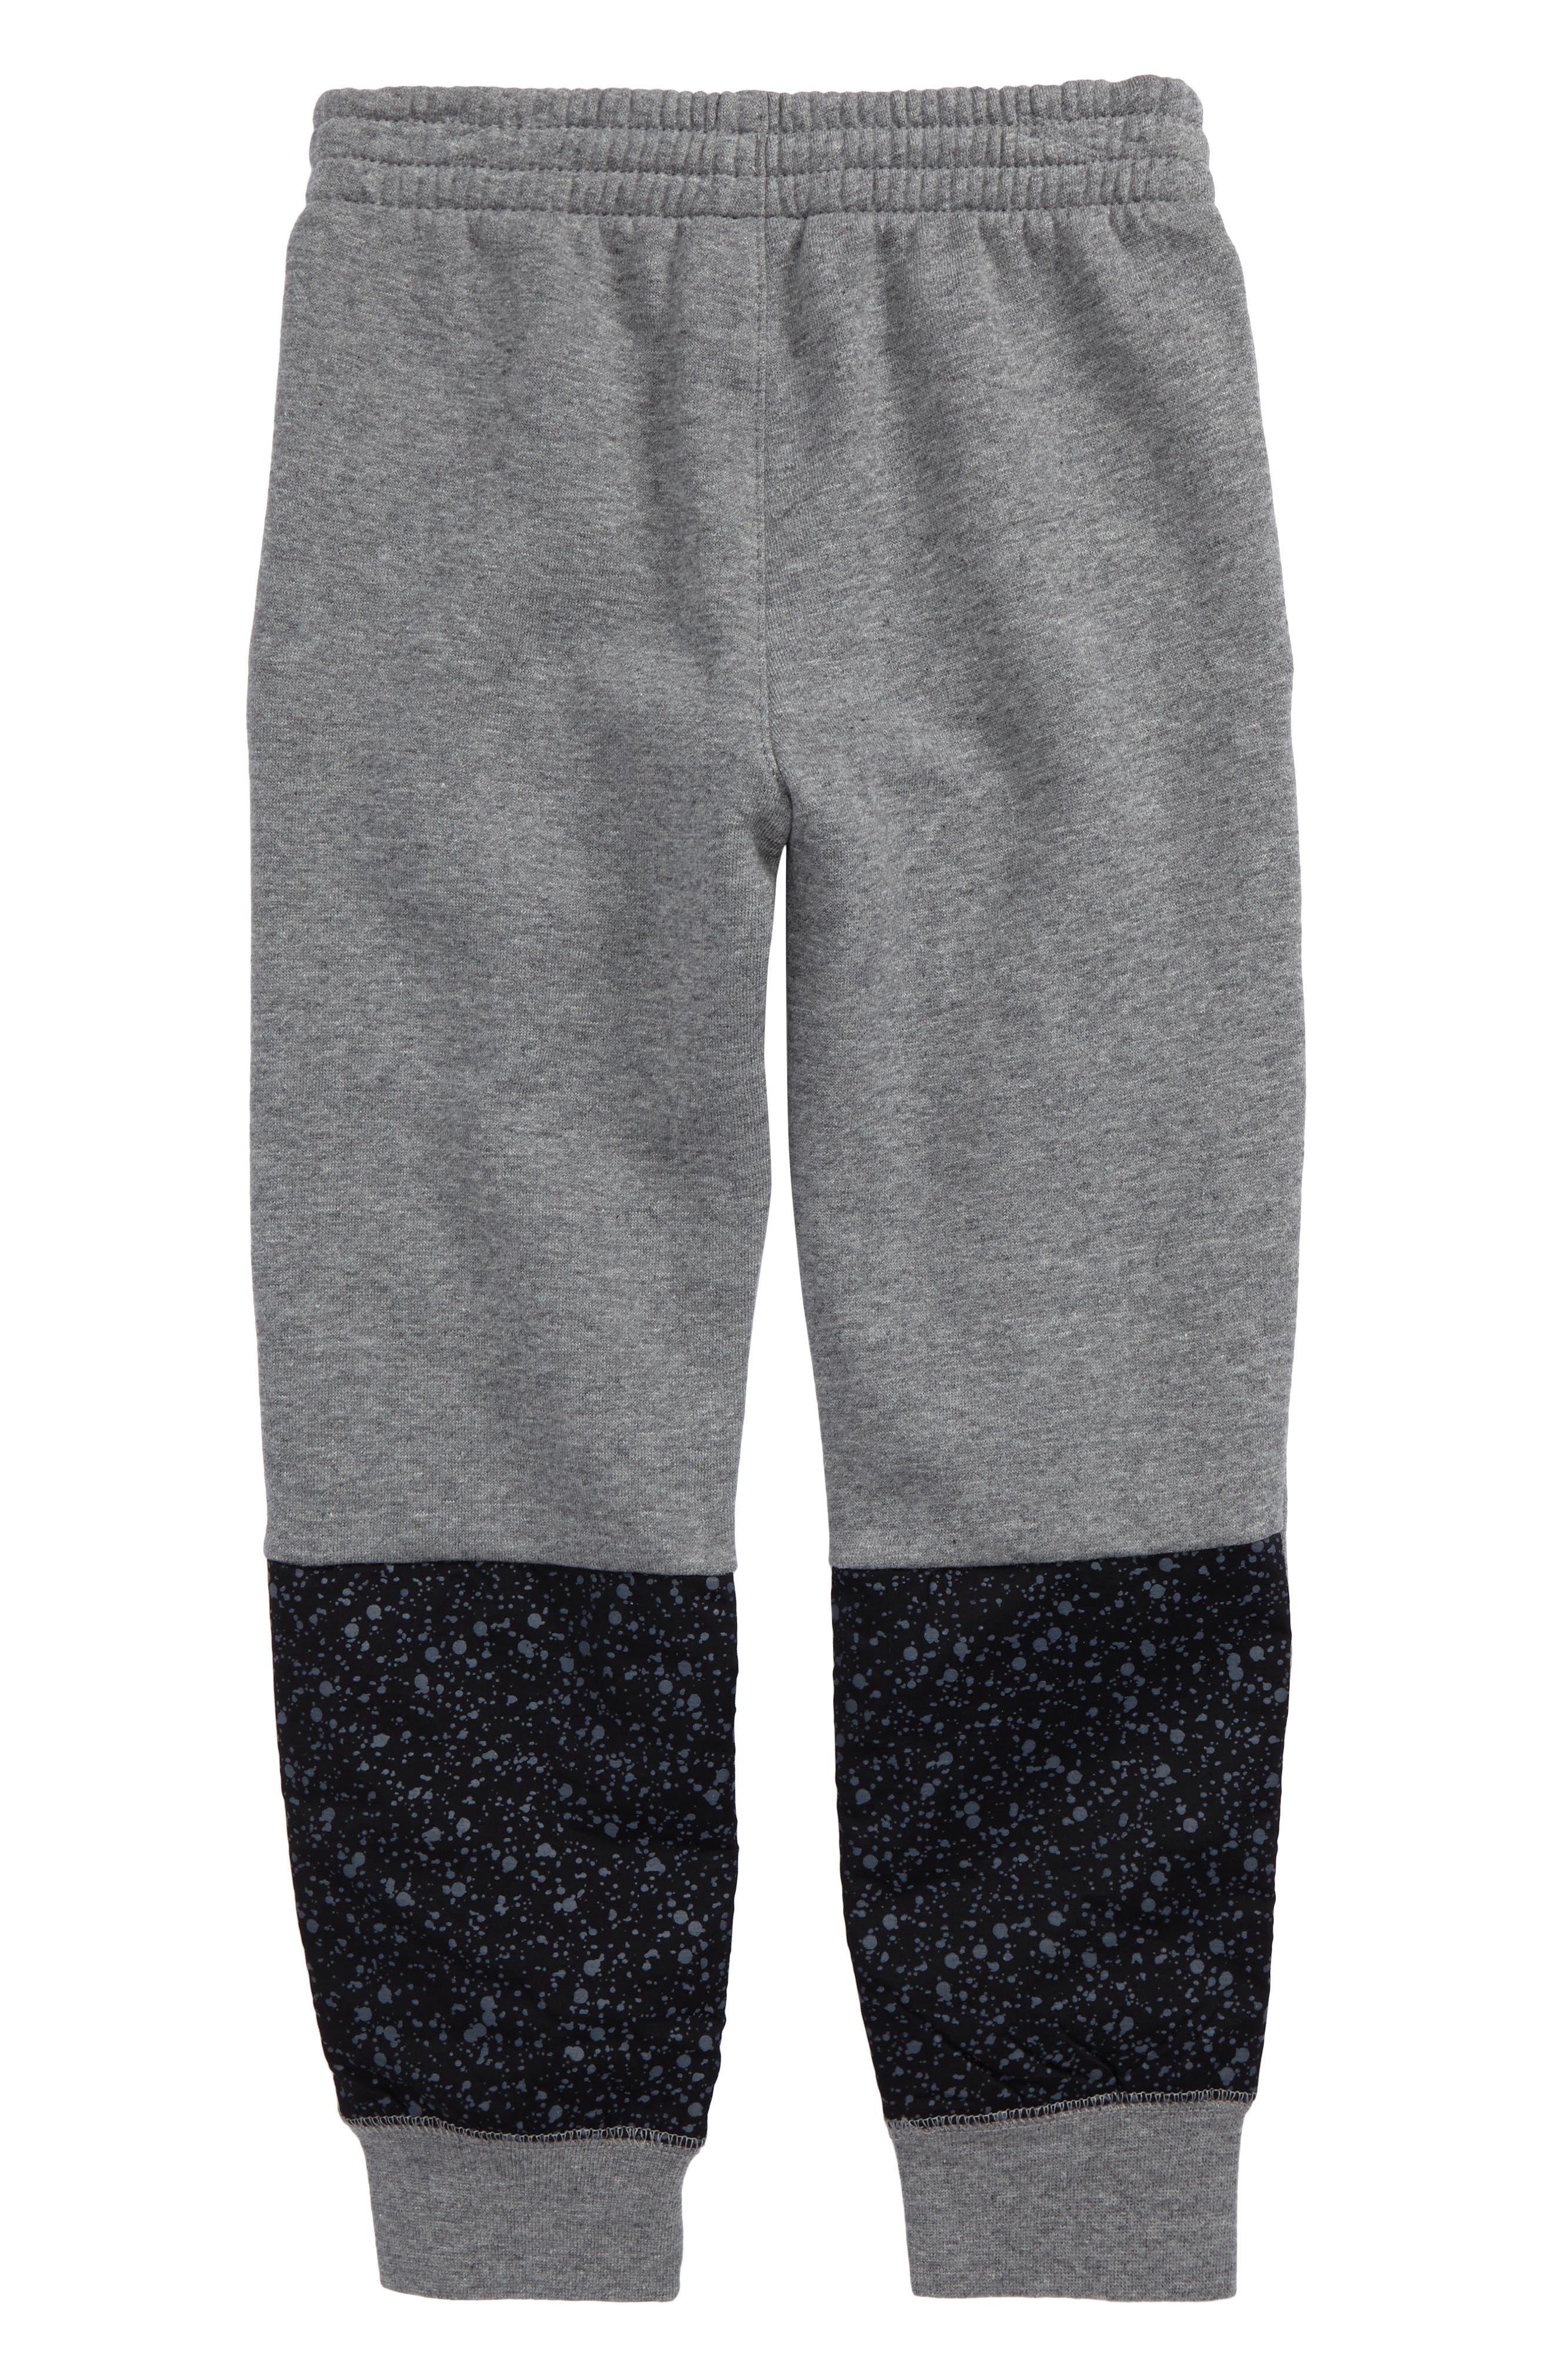 Jordan Flight Sweatpants,                             Alternate thumbnail 4, color,